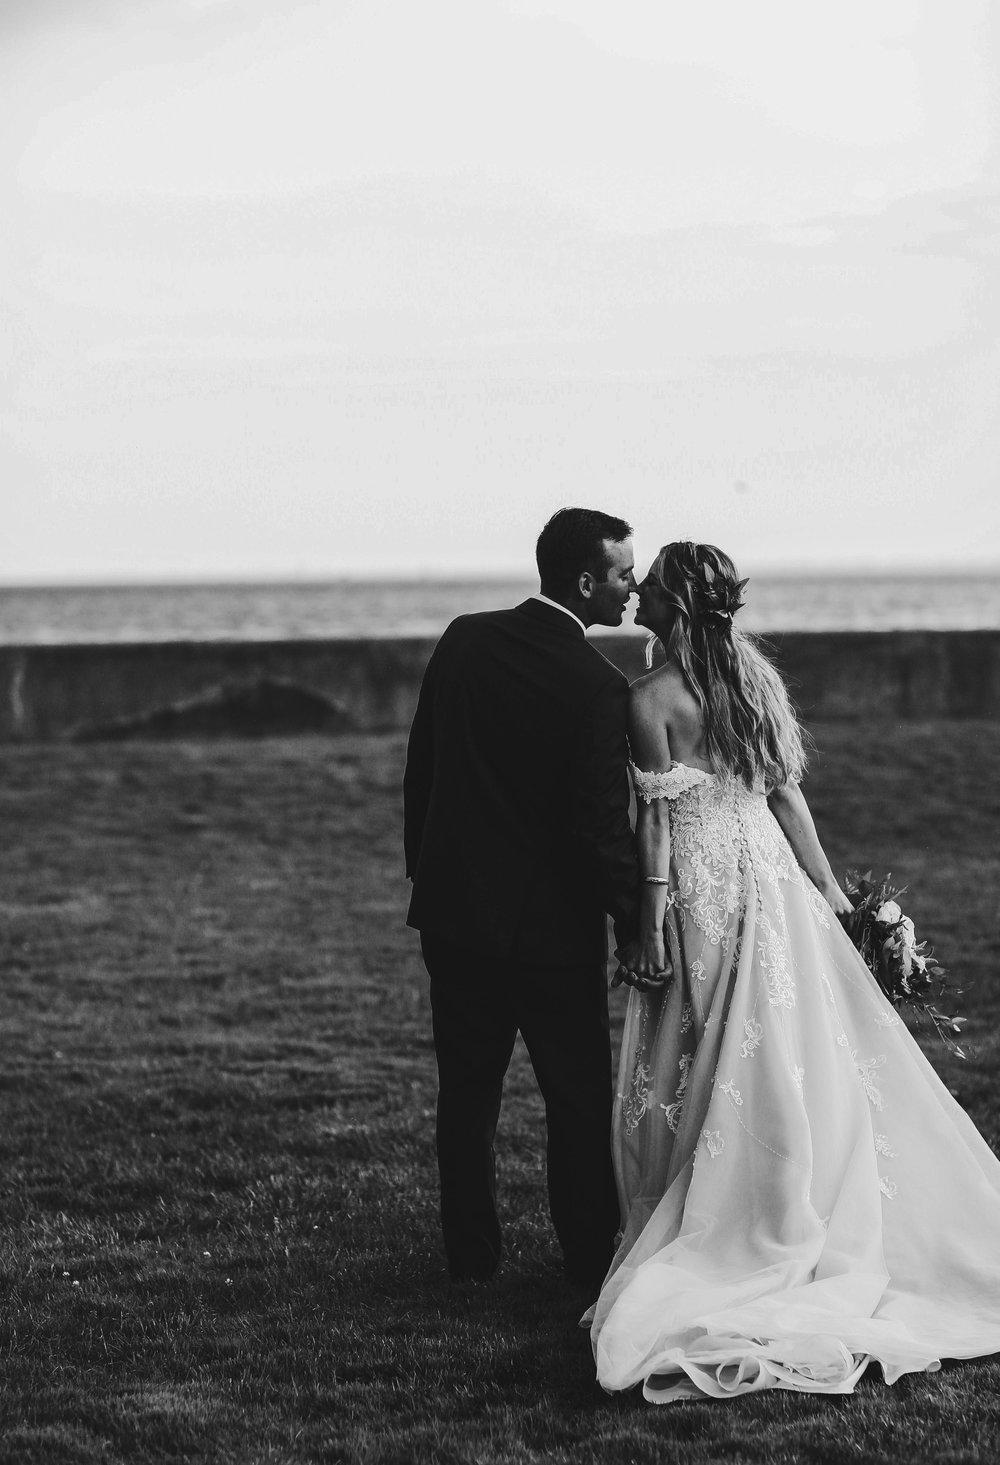 C+S_WeddingDay_501.JPG